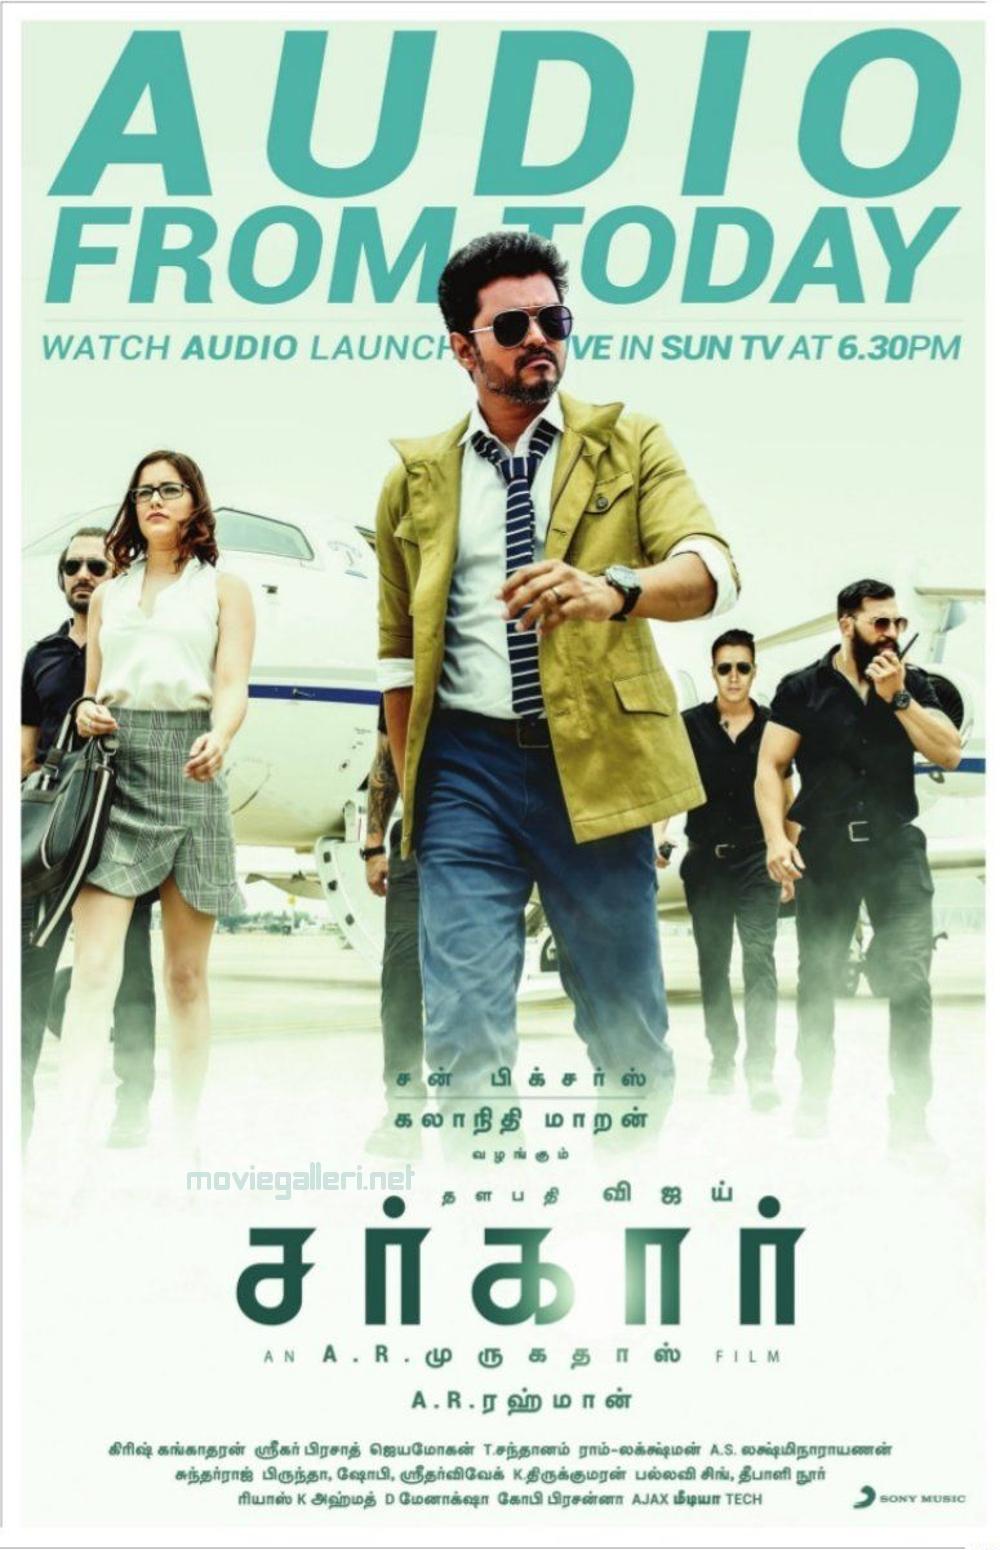 Vijay Sarkar Audio Release Today Poster HD